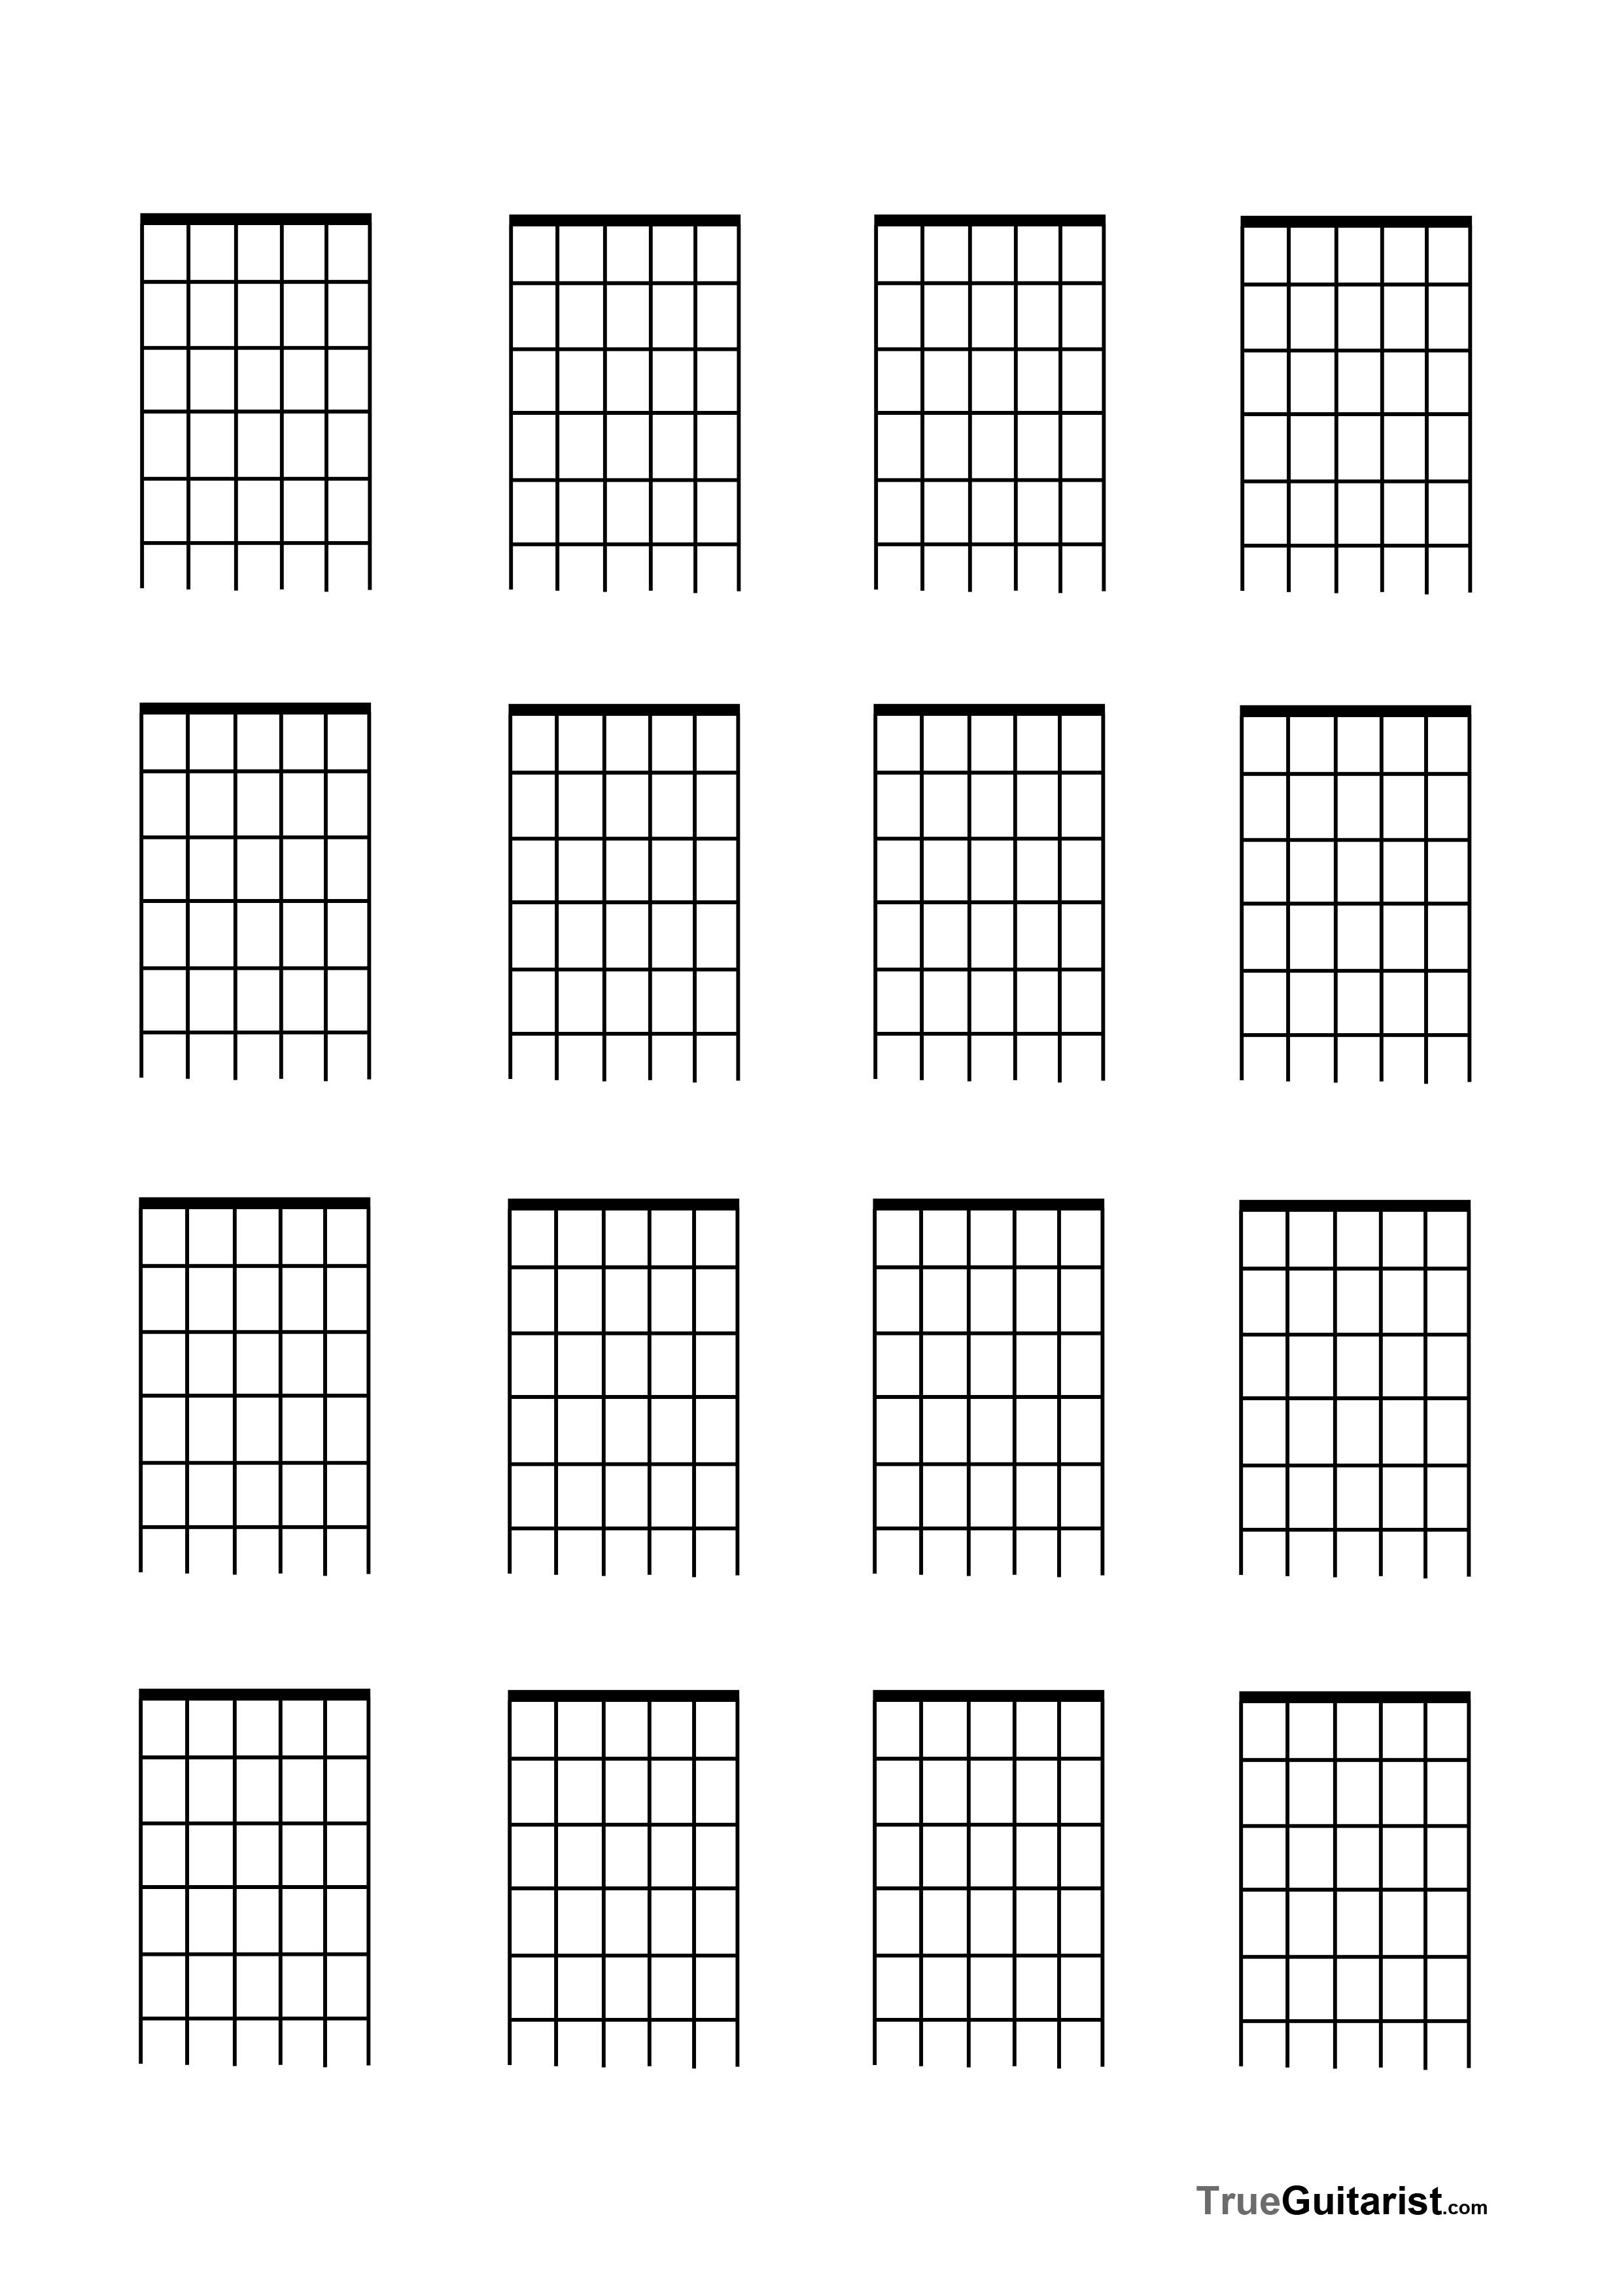 Blank Guitar Fretboard Diagramfree Blank Music Paper Templates Trueguitarist 0vysgrdm